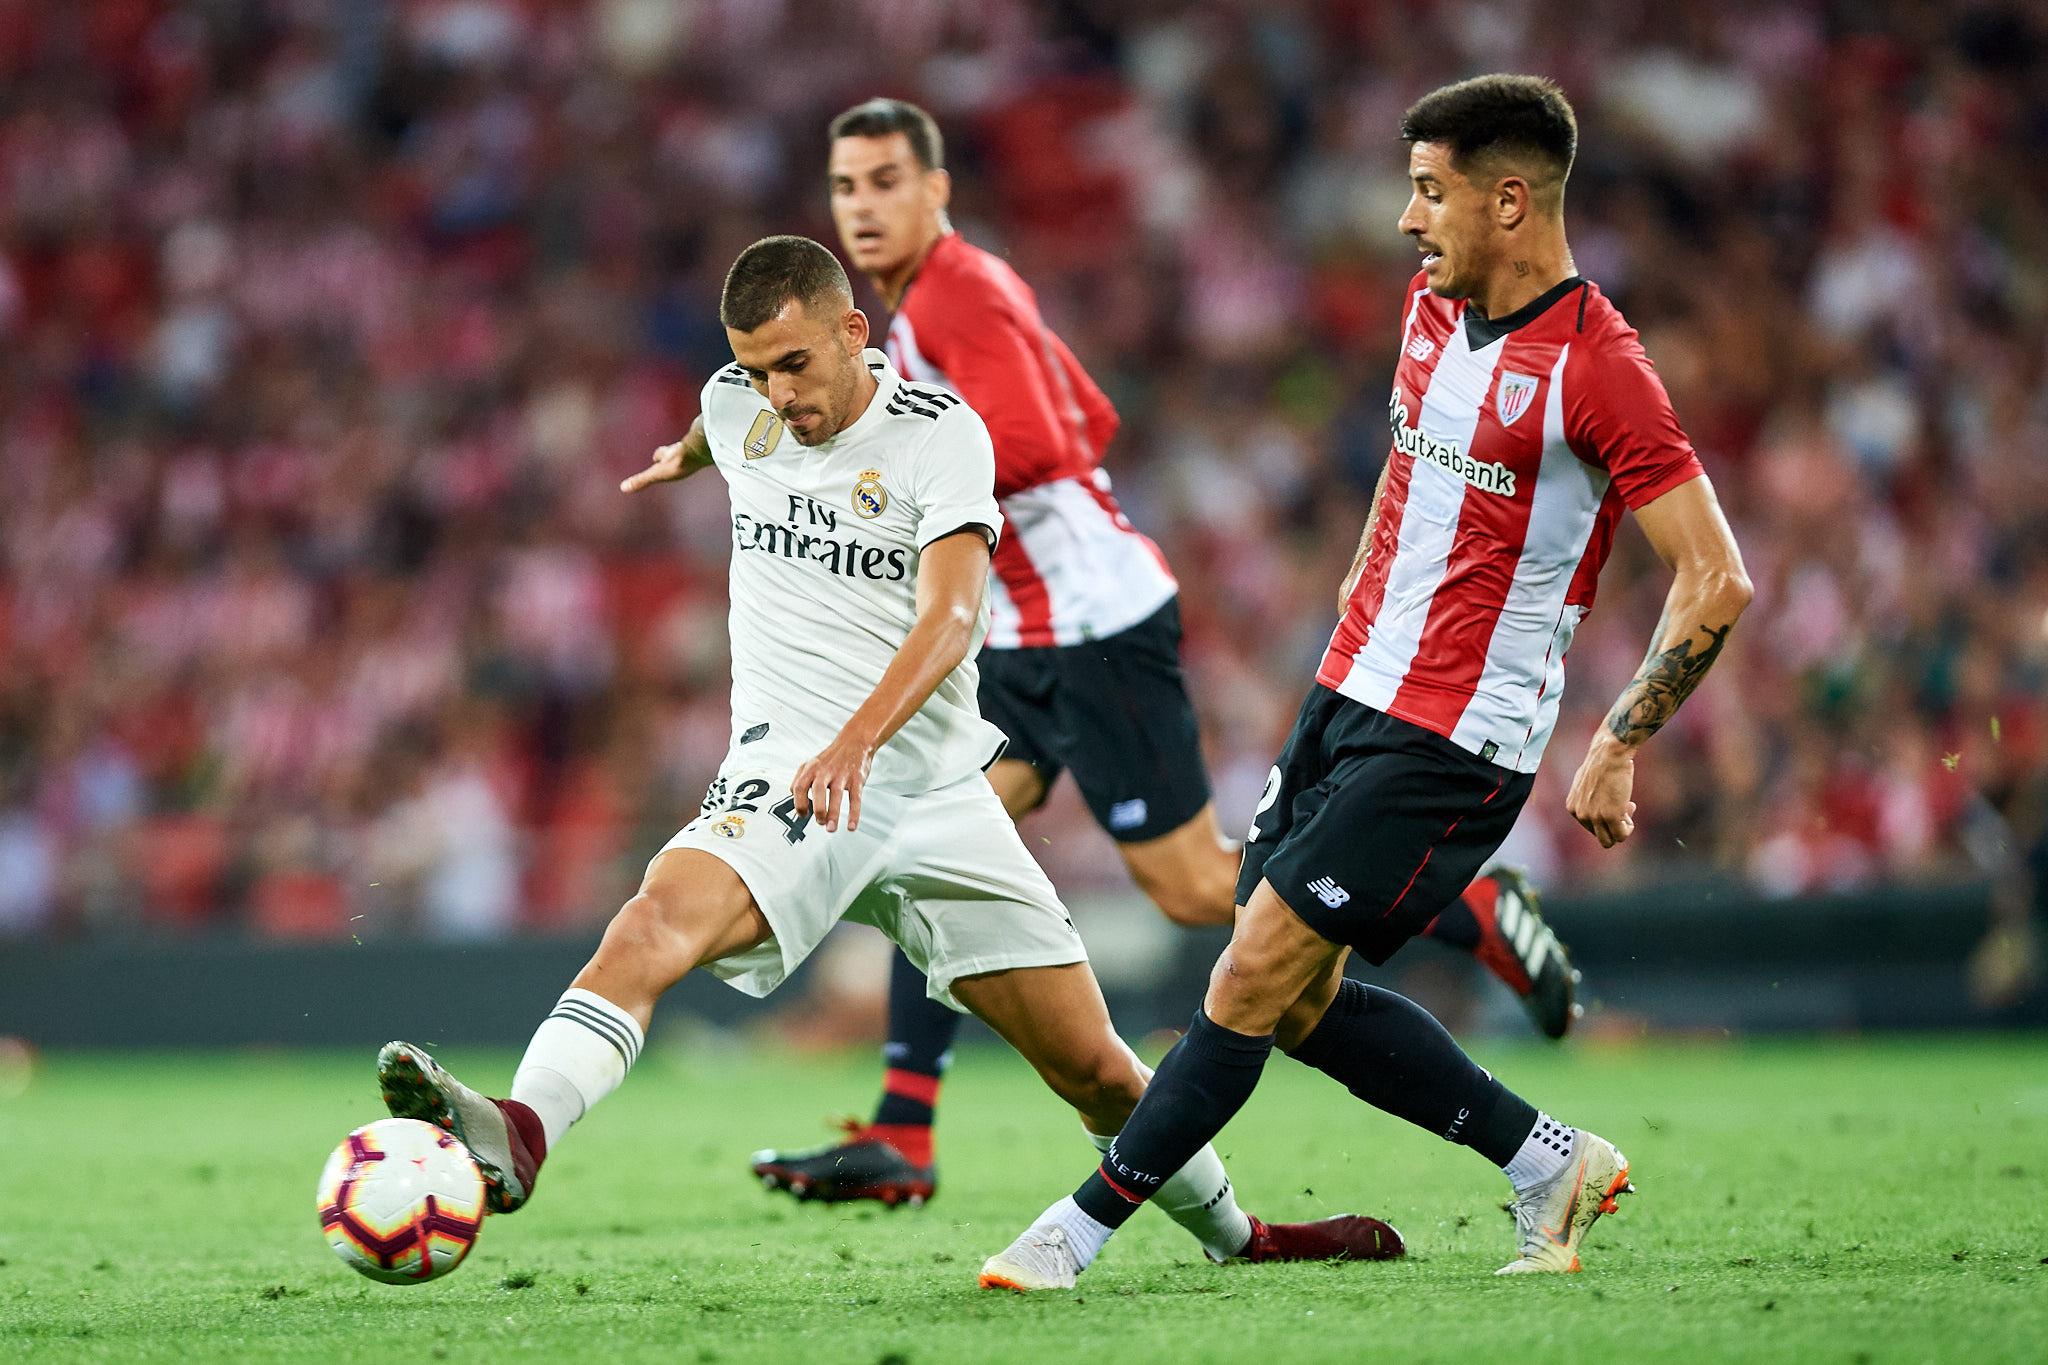 fdd63575a Midfielder Dani Ceballos looks set to be an El Clasico debutant on for Real  Madrid